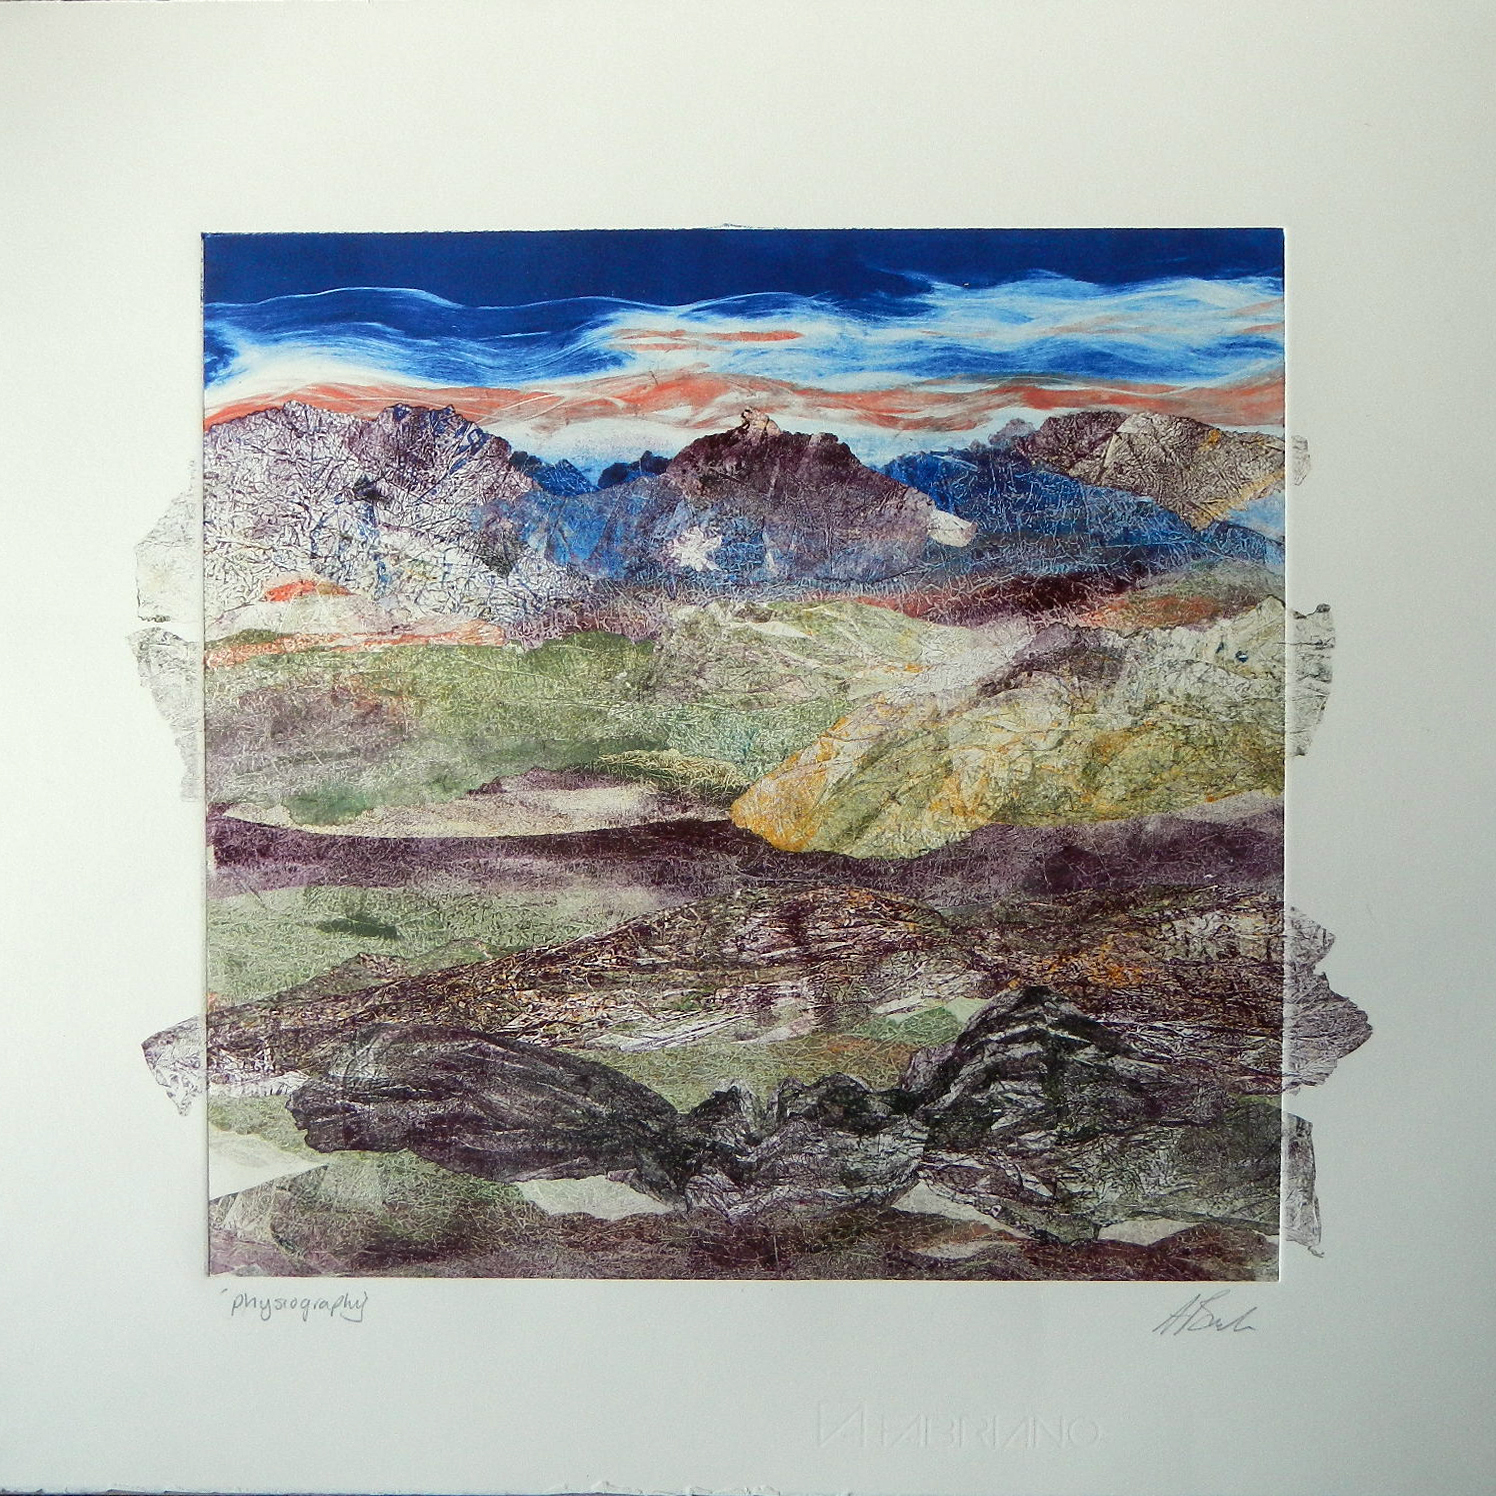 Adele Burdon. Physiography (unique print)